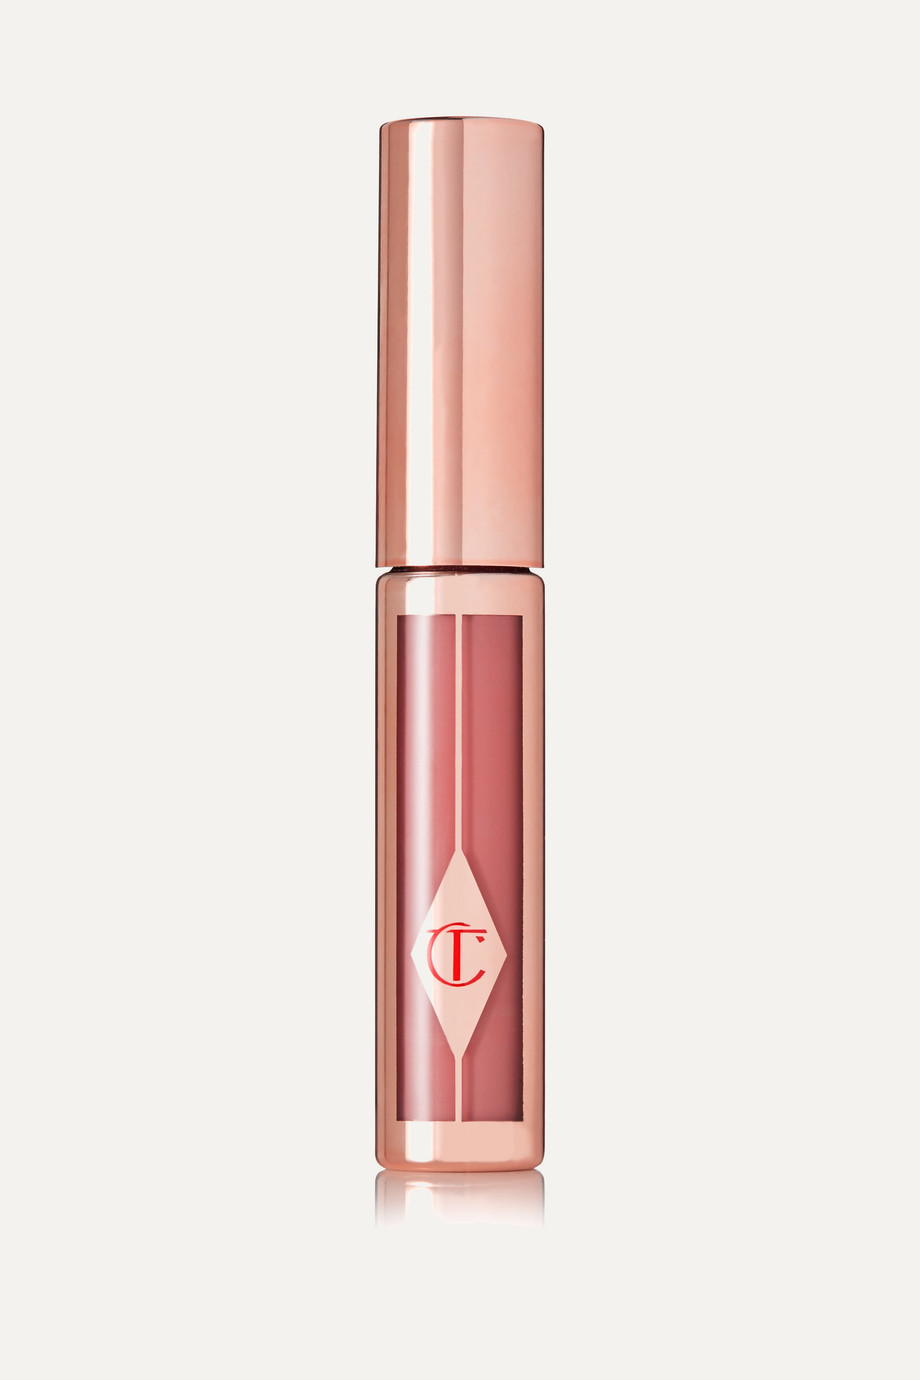 Charlotte Tilbury Hollywood Lips Matte Contour Liquid Lipstick – Too Bad I'm Bad